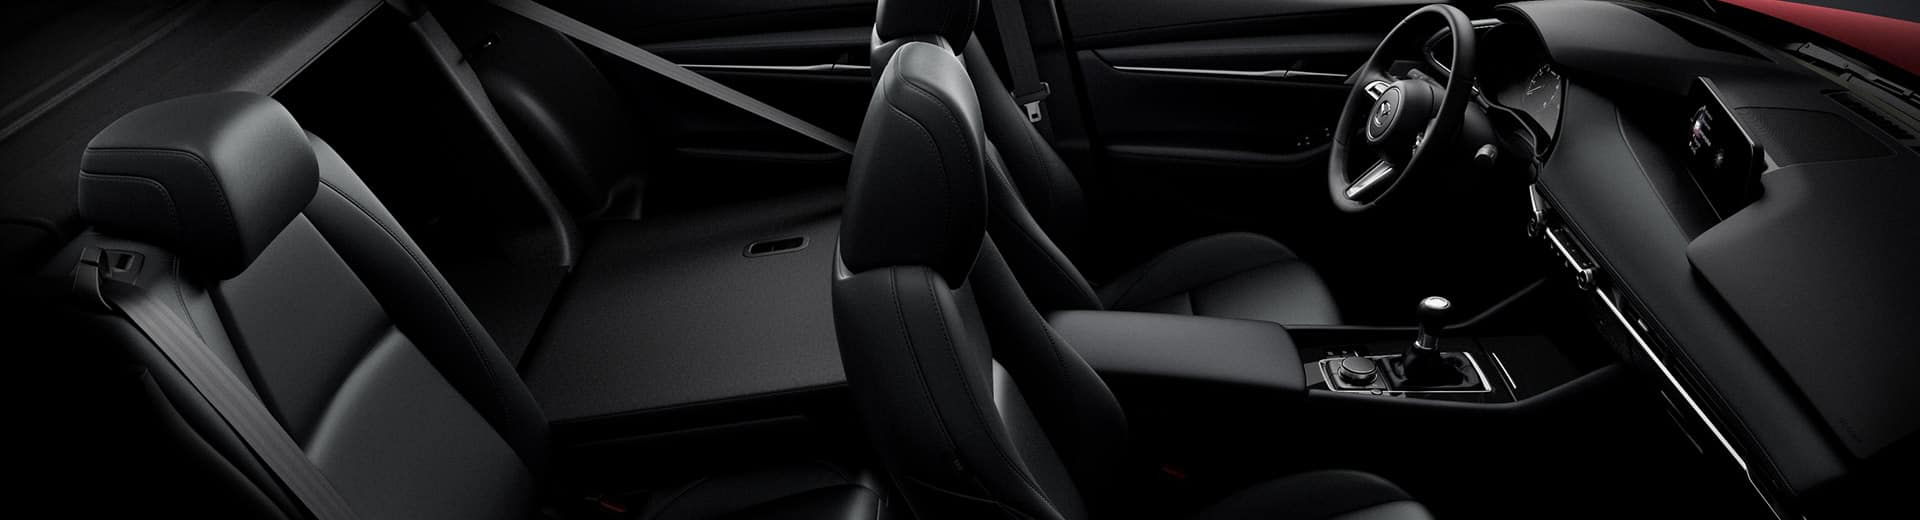 Versatile Design on the Mazda3 Sport in London Ontario